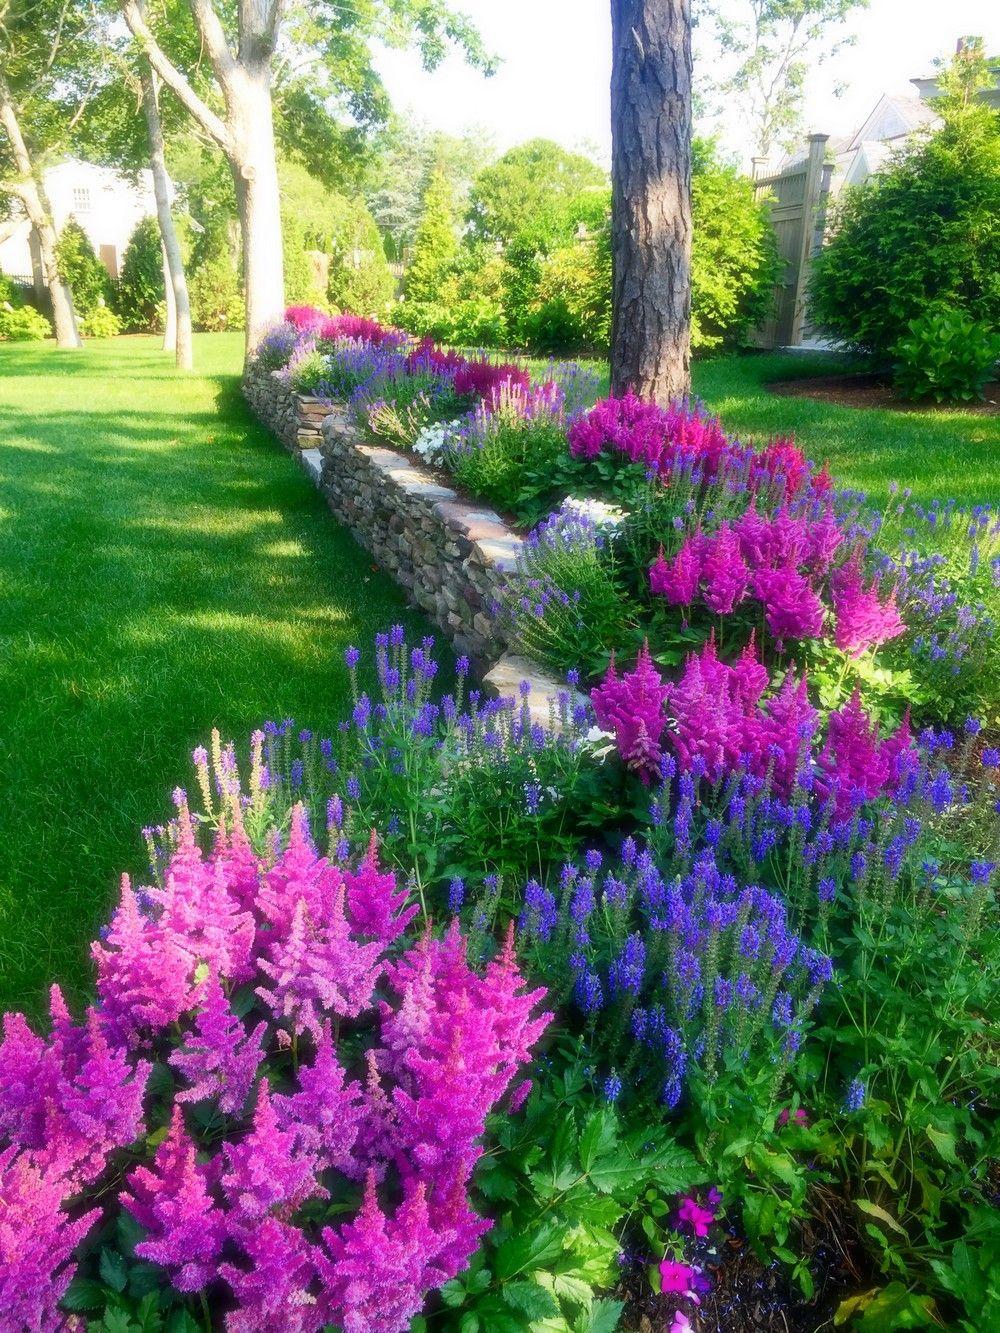 Pin by Heather Looper on Gardening   Pinterest   Yard ...